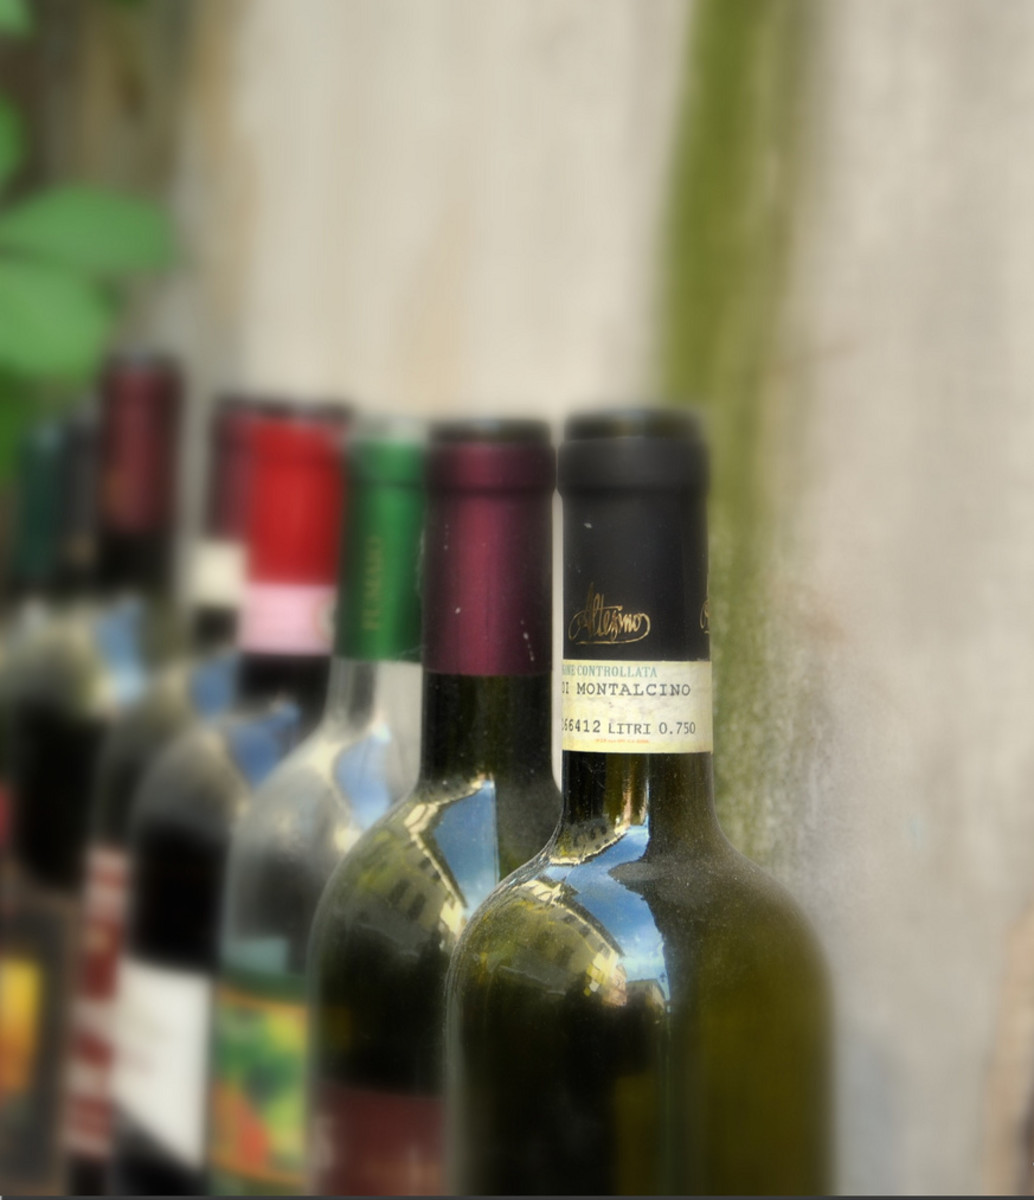 29 New Non-GMO Verified Wines to Love - Organic Authority